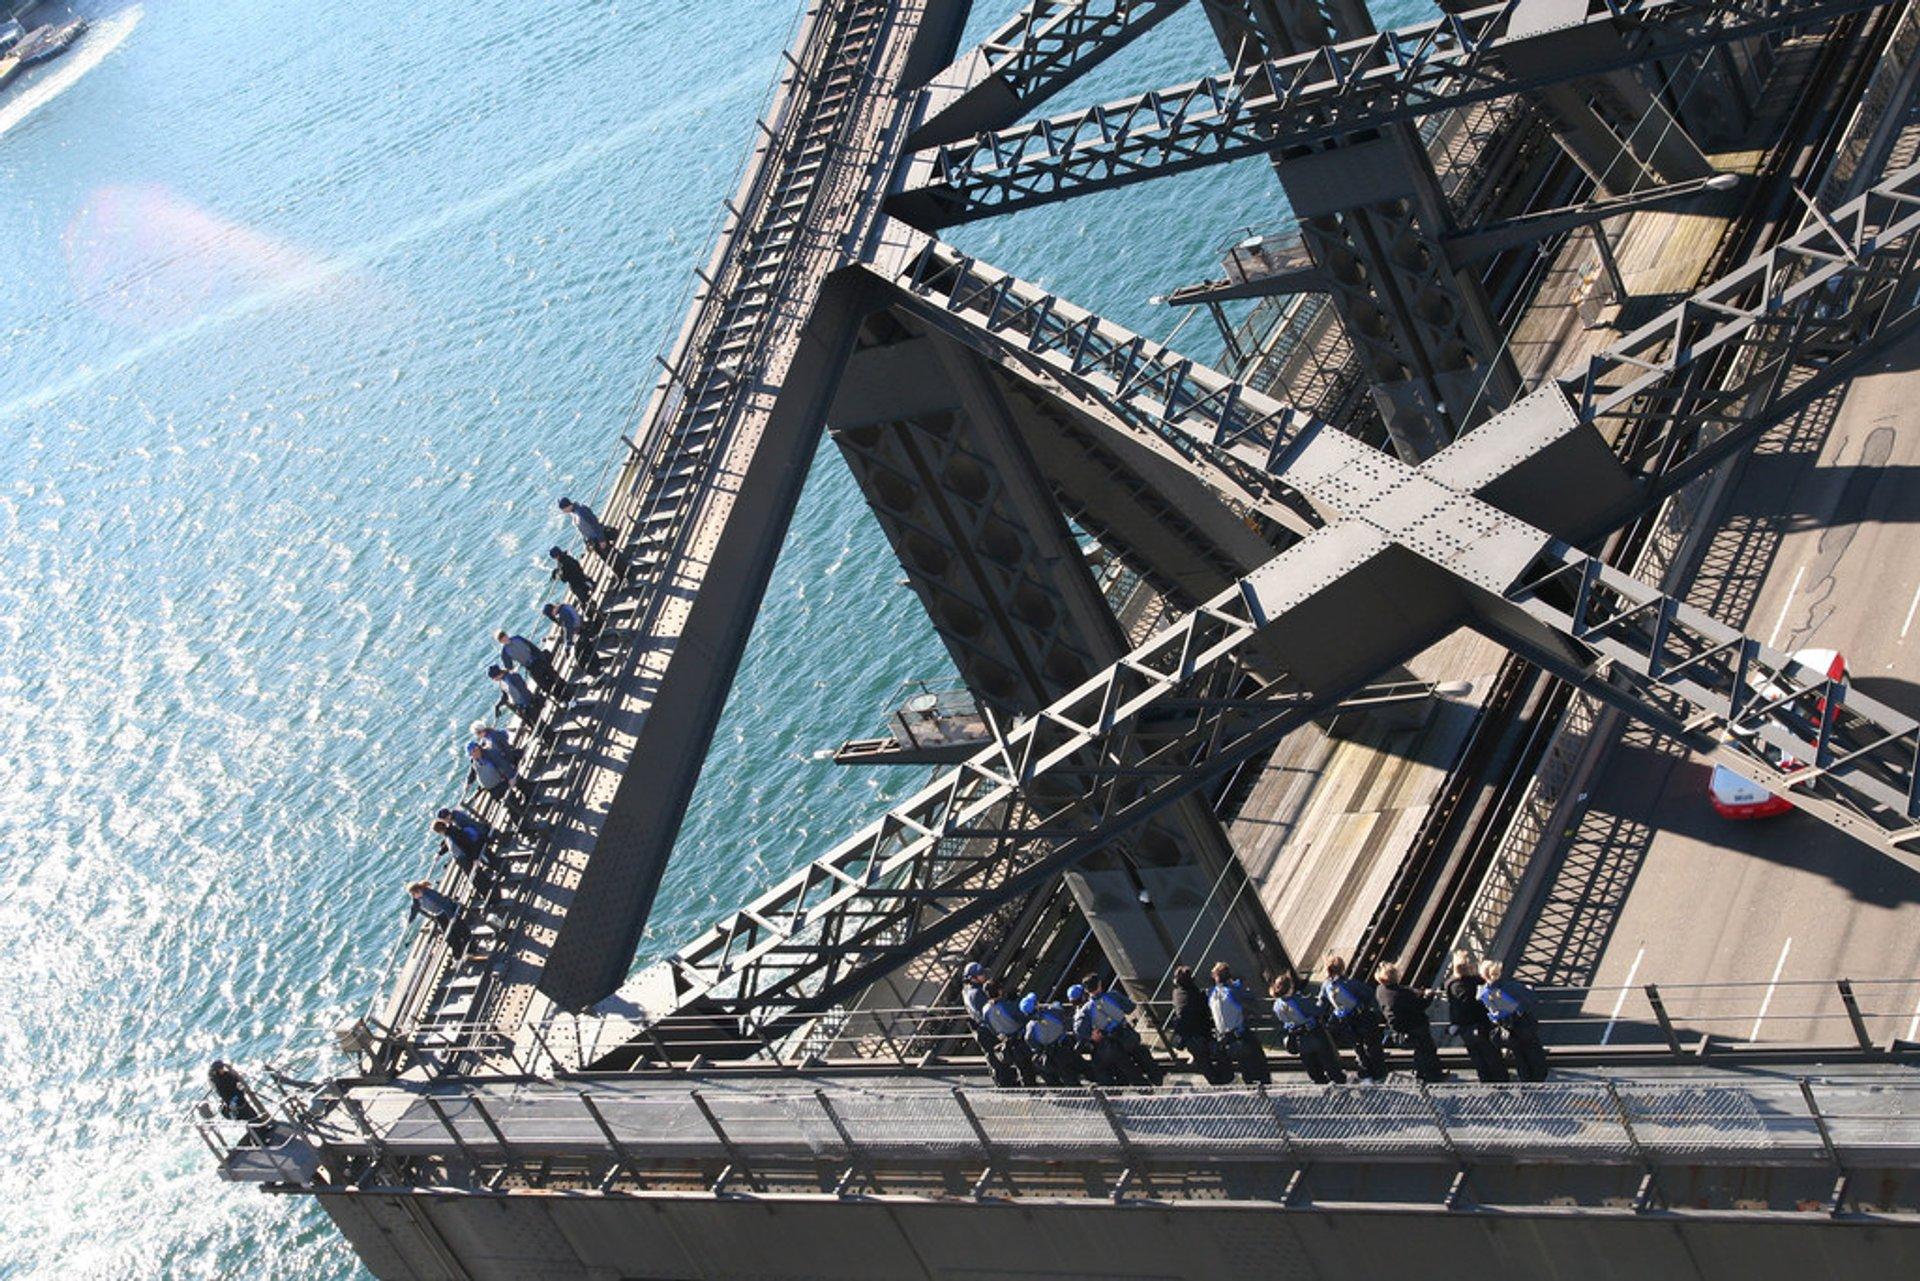 Sydney Harbour Bridge Climb in Sydney - Best Season 2019